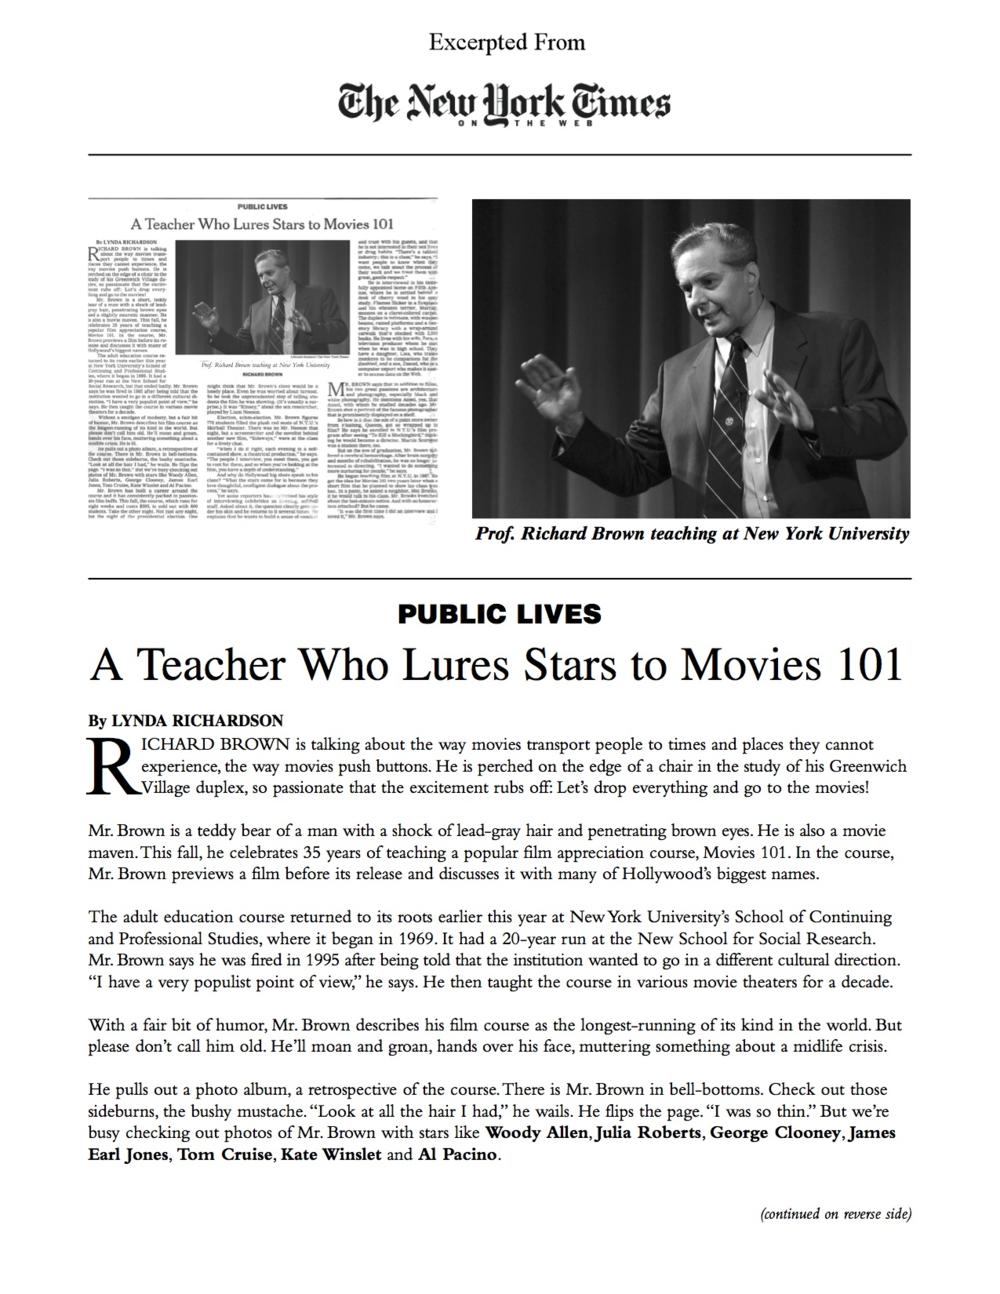 NYT Public Lives